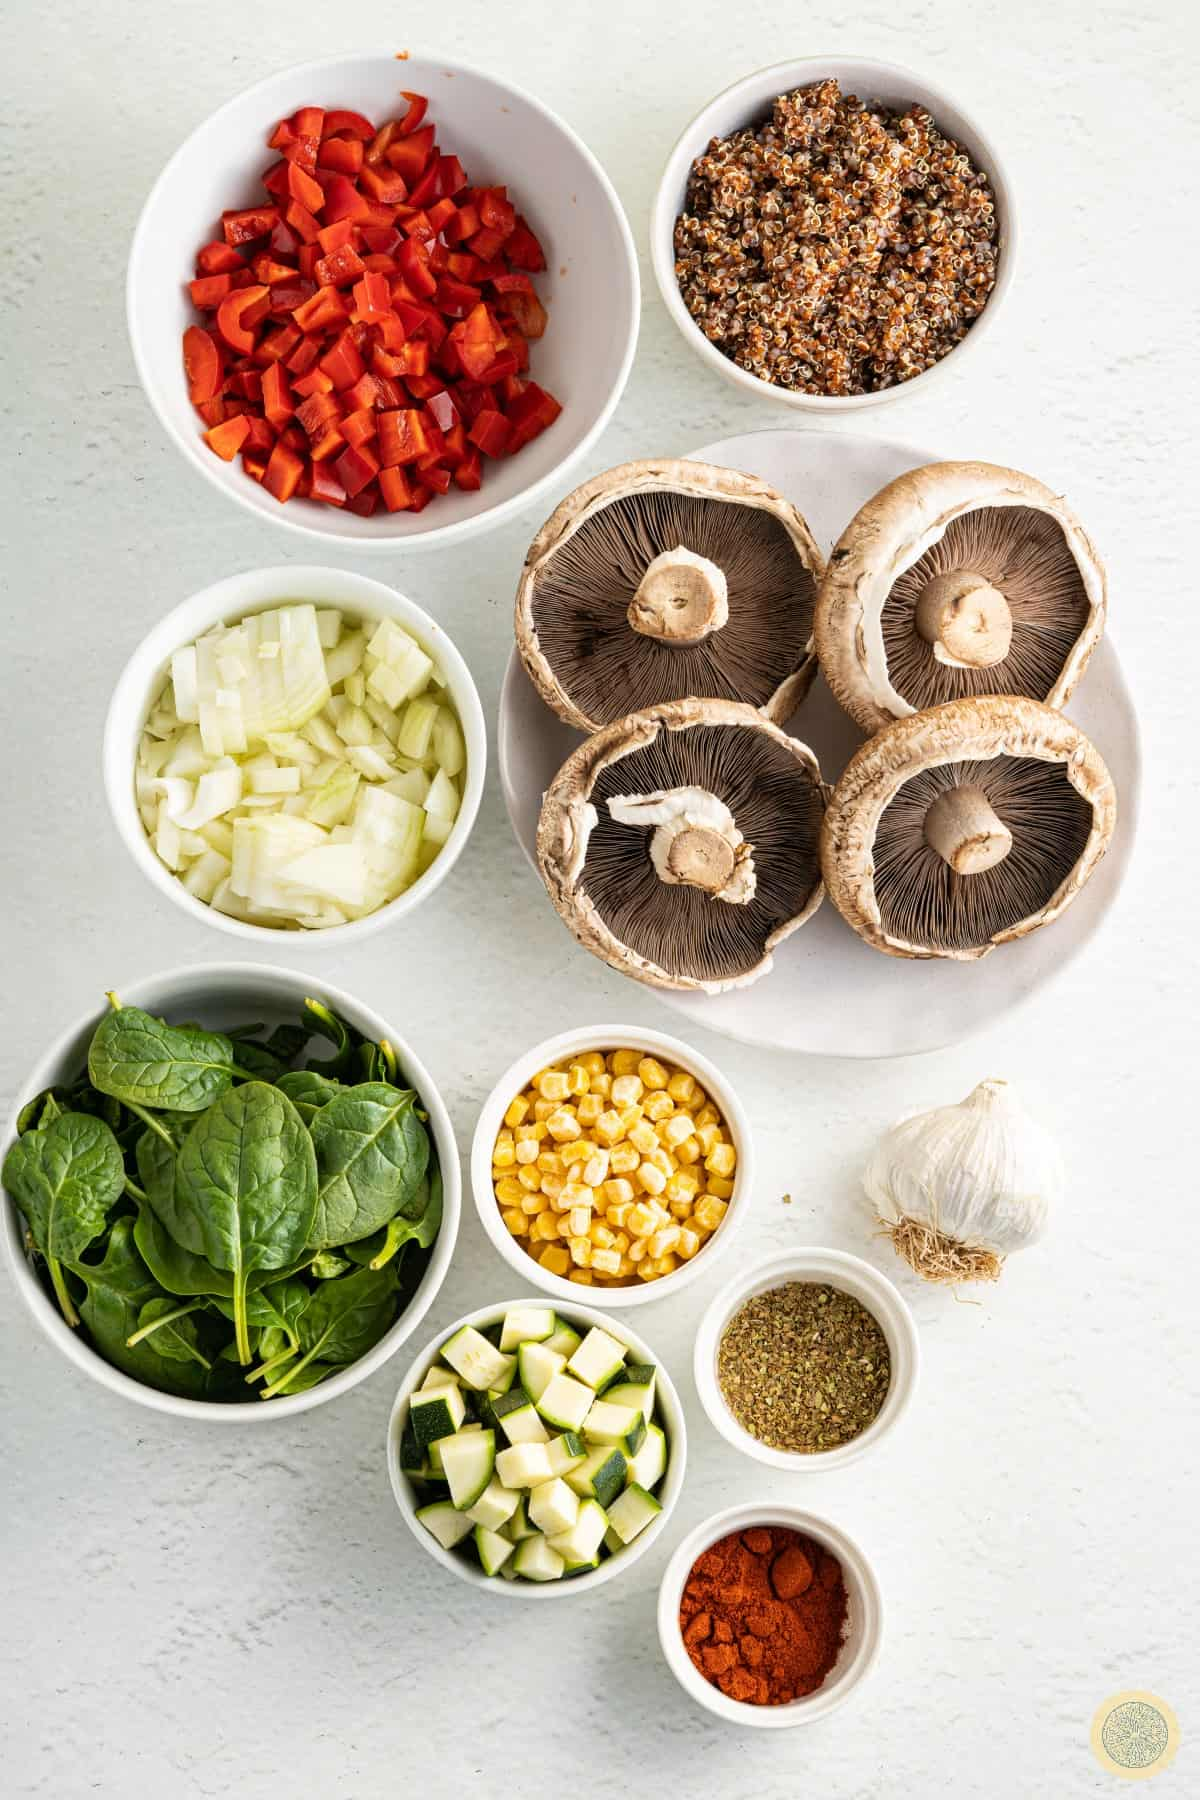 Vegan Stuffed Portobello Mushrooms Ingredients